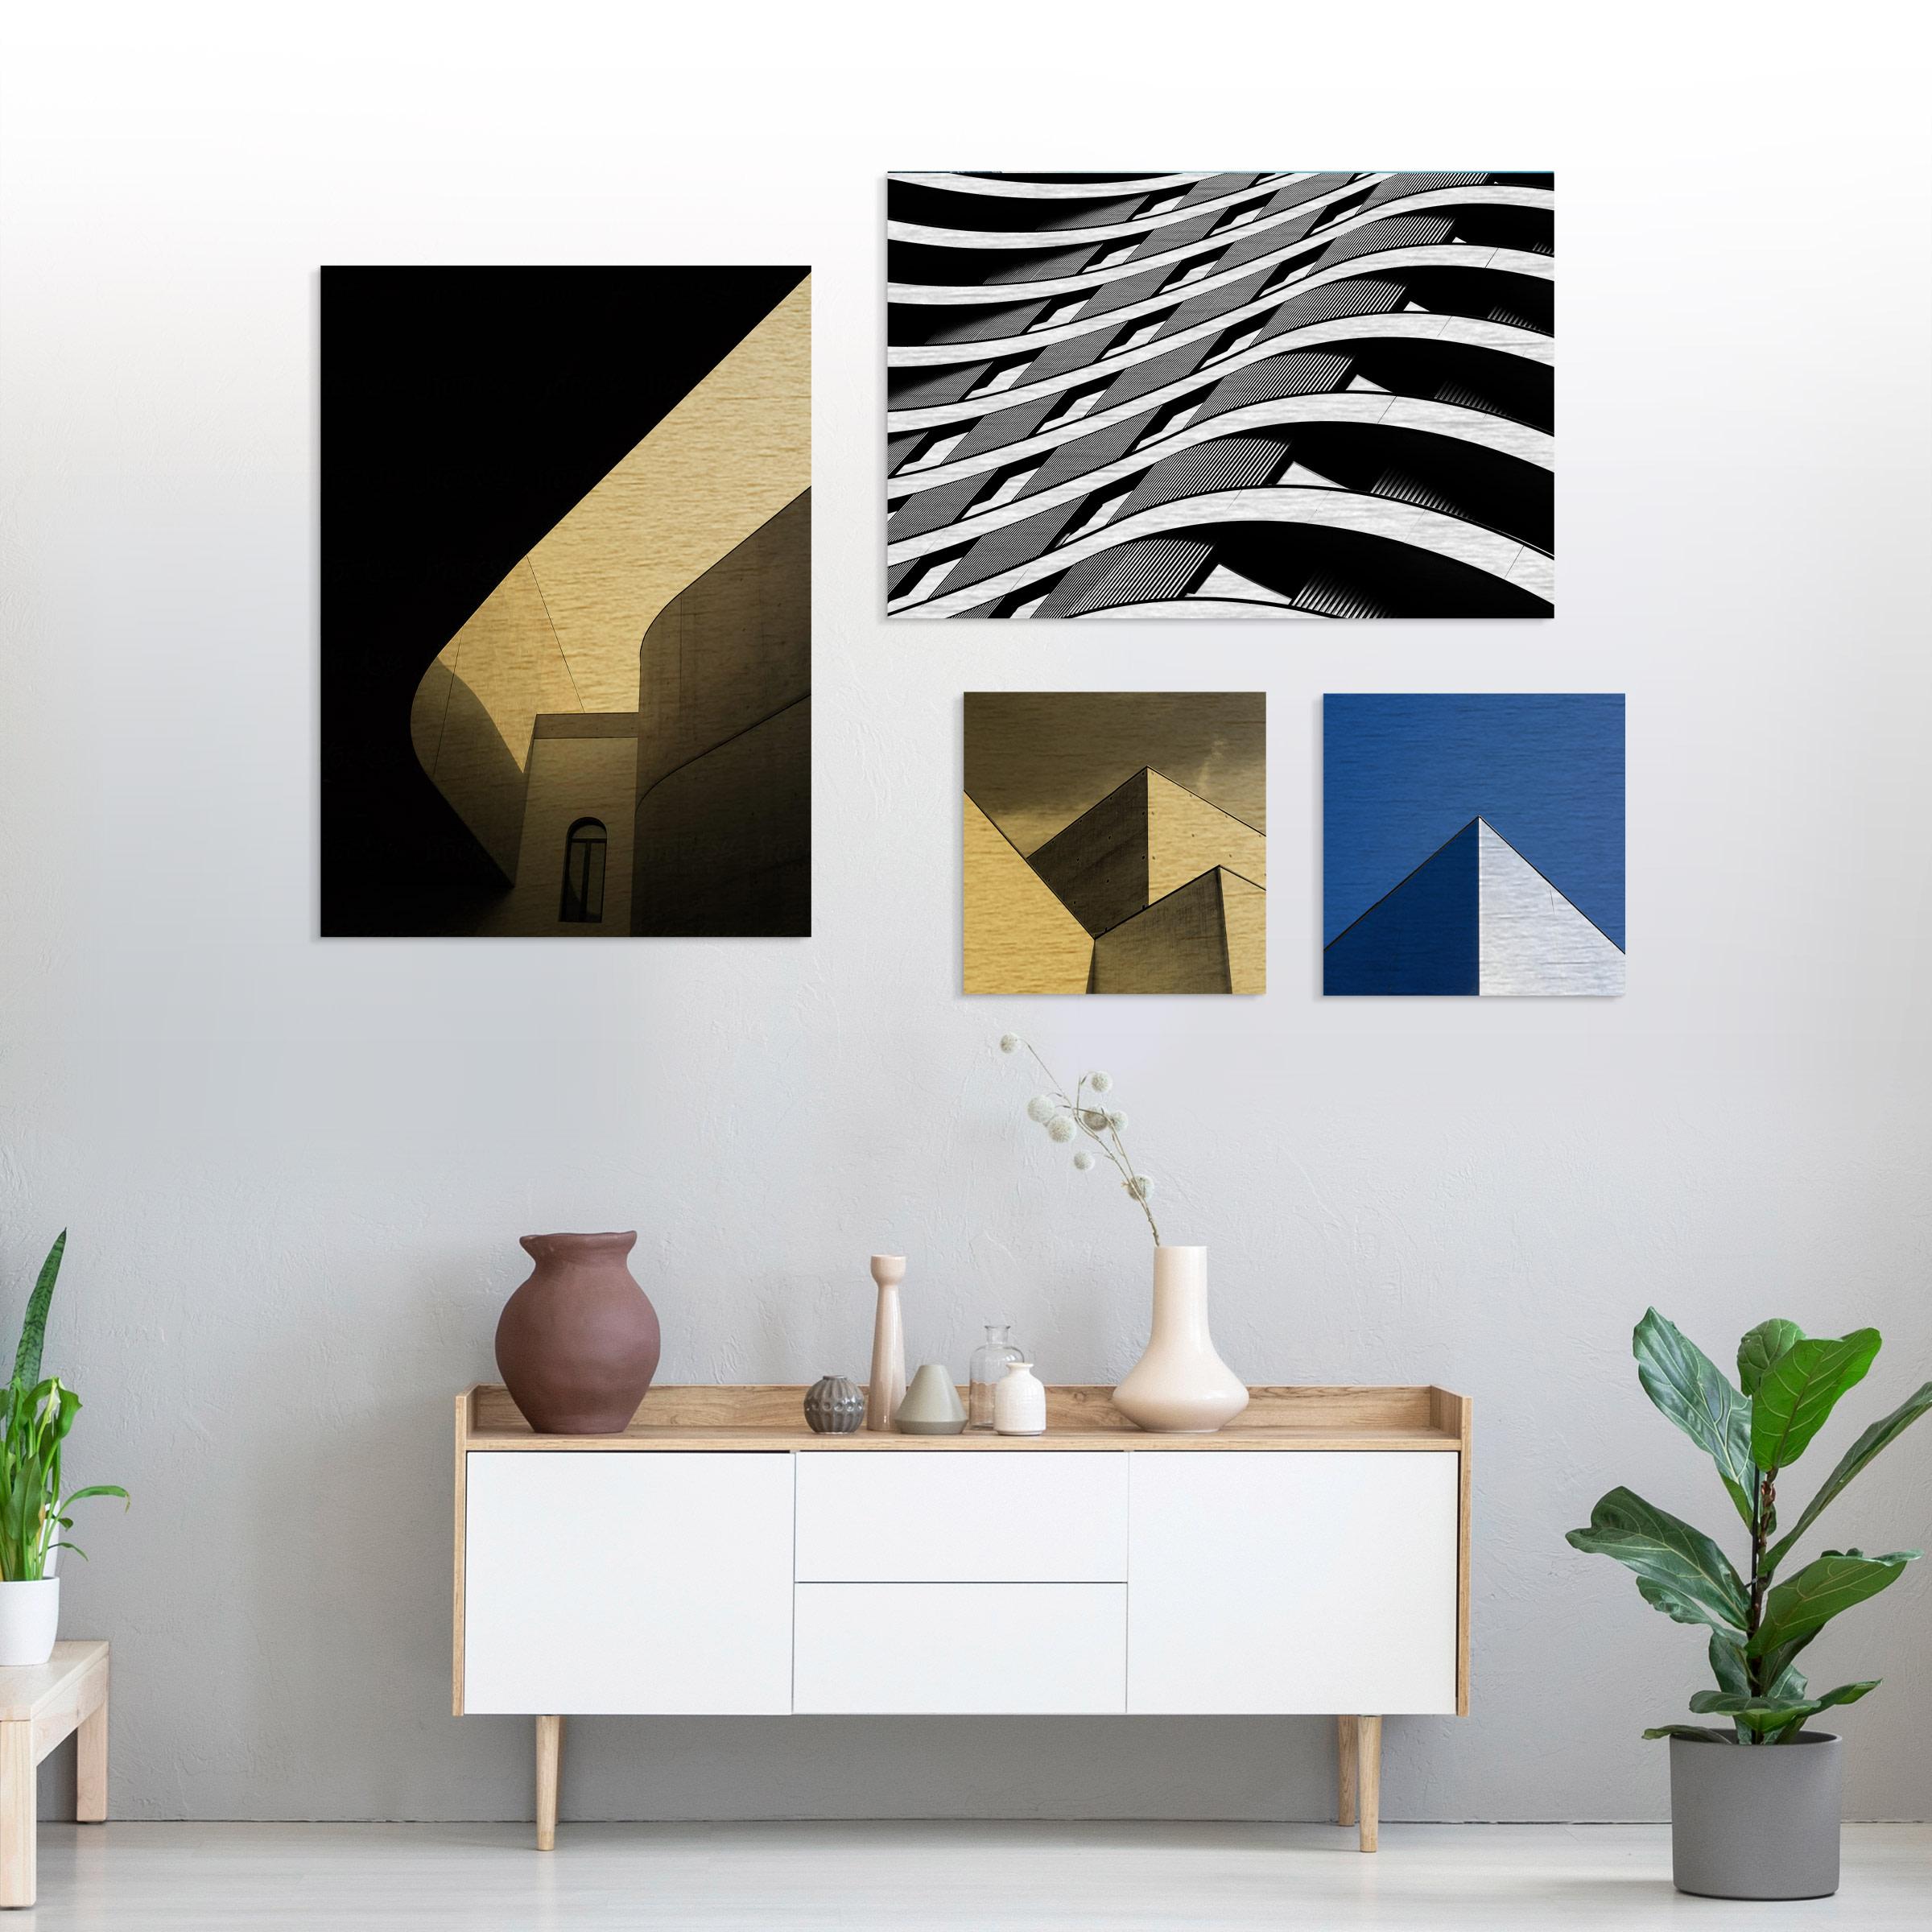 fotodruck-auf-aludibond-butlerfinish-architektur-inspi-1200x1200.jpg